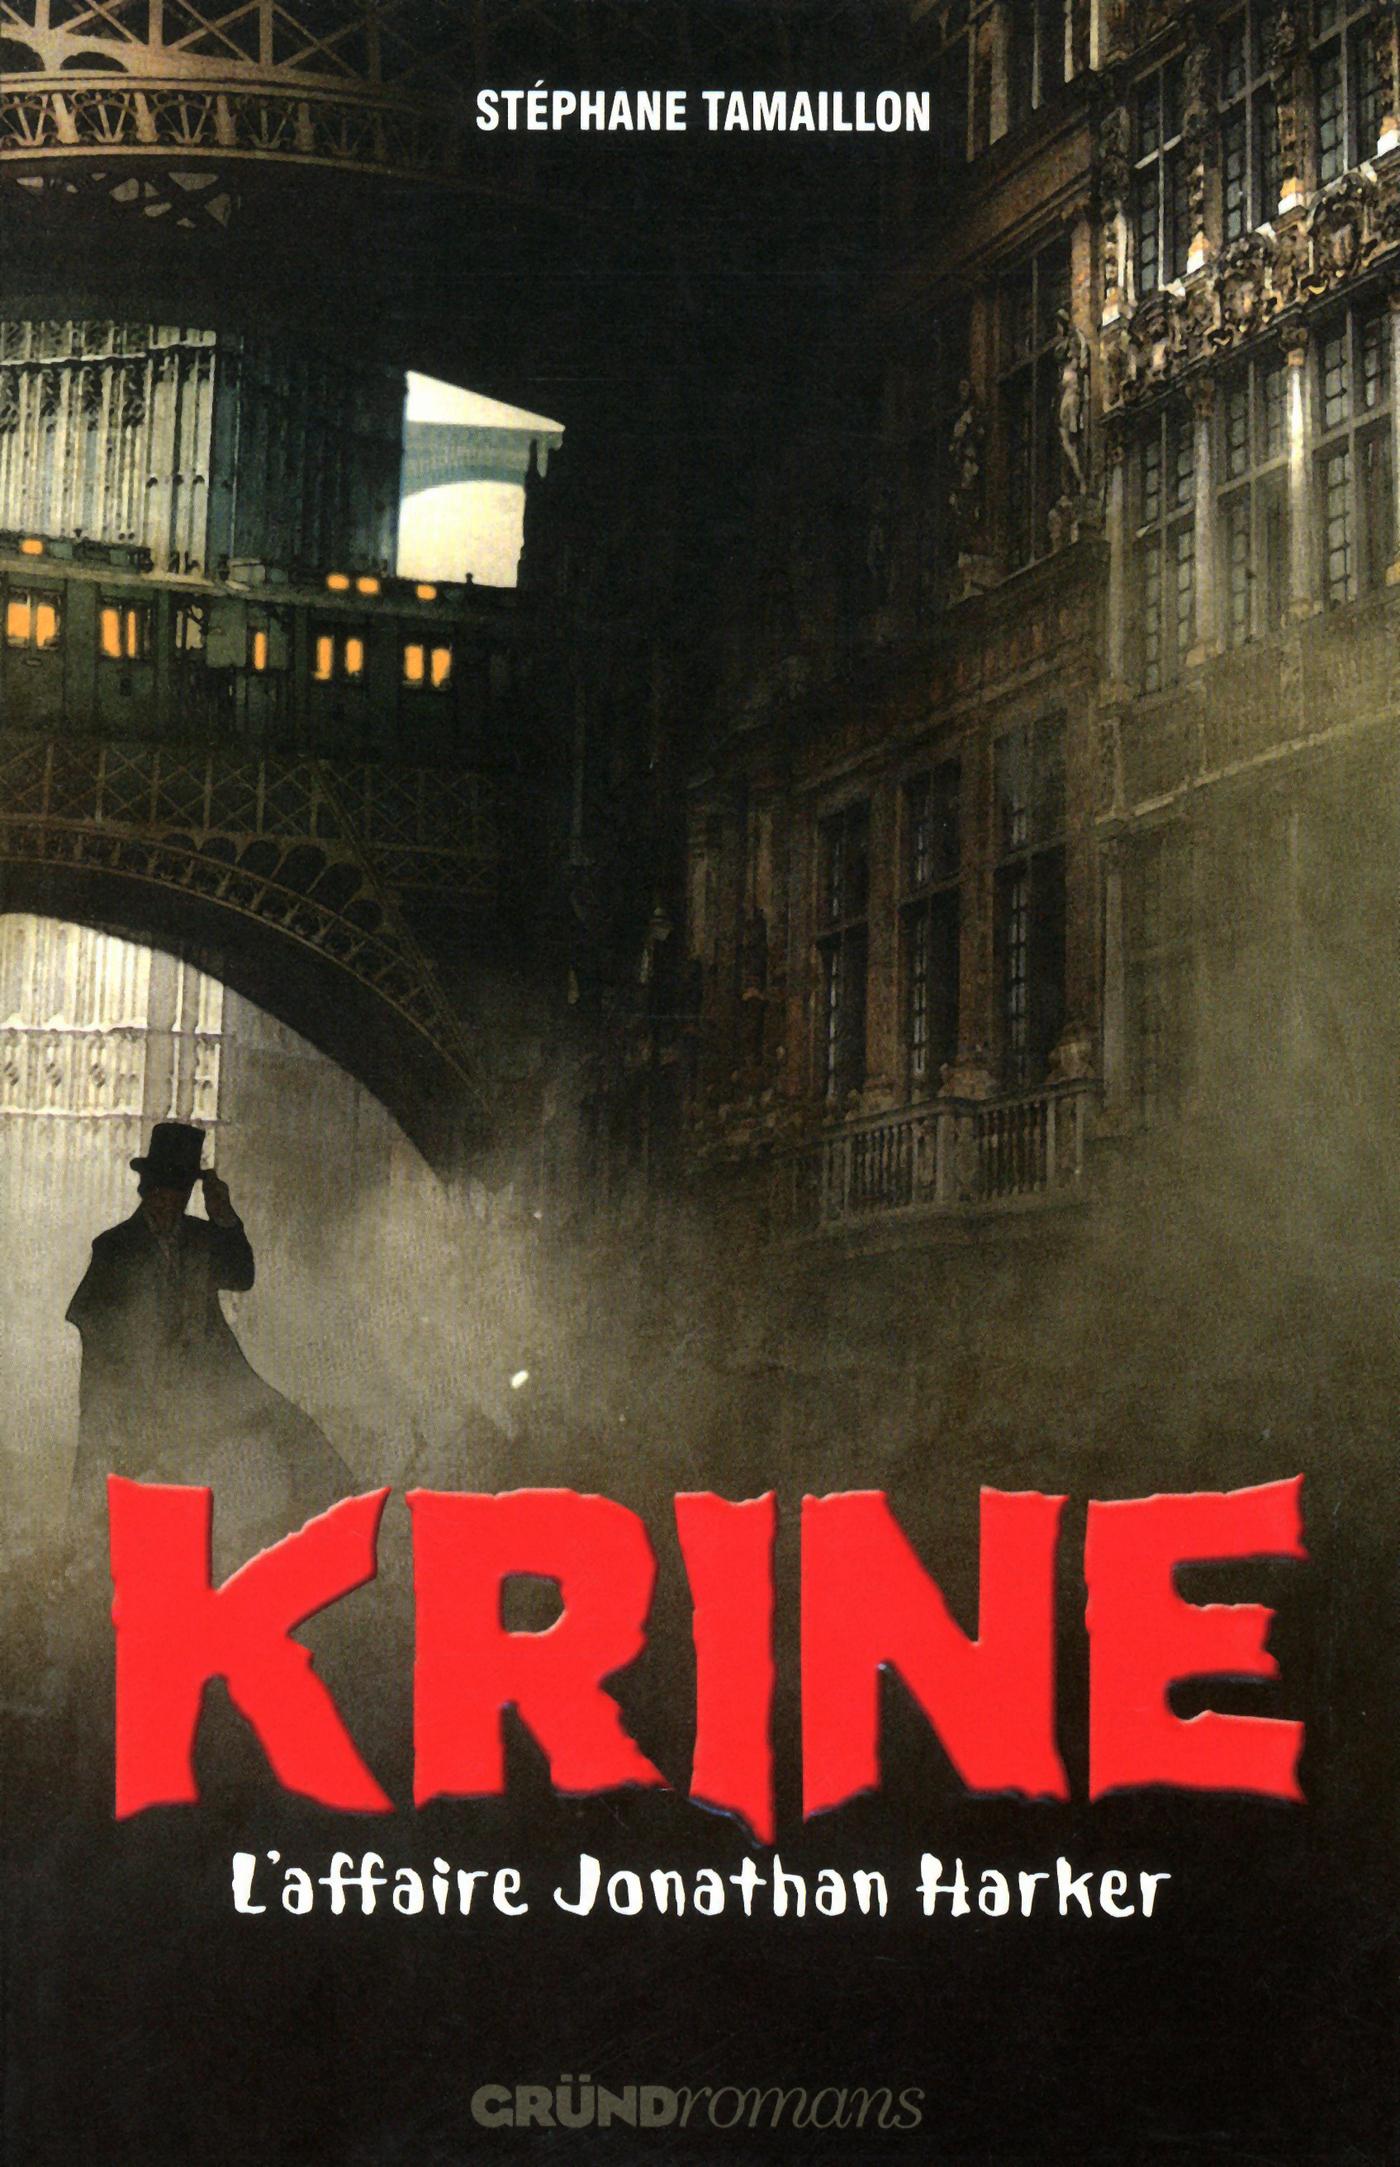 KRINE L'AFFAIRE JONATHAN HARKER